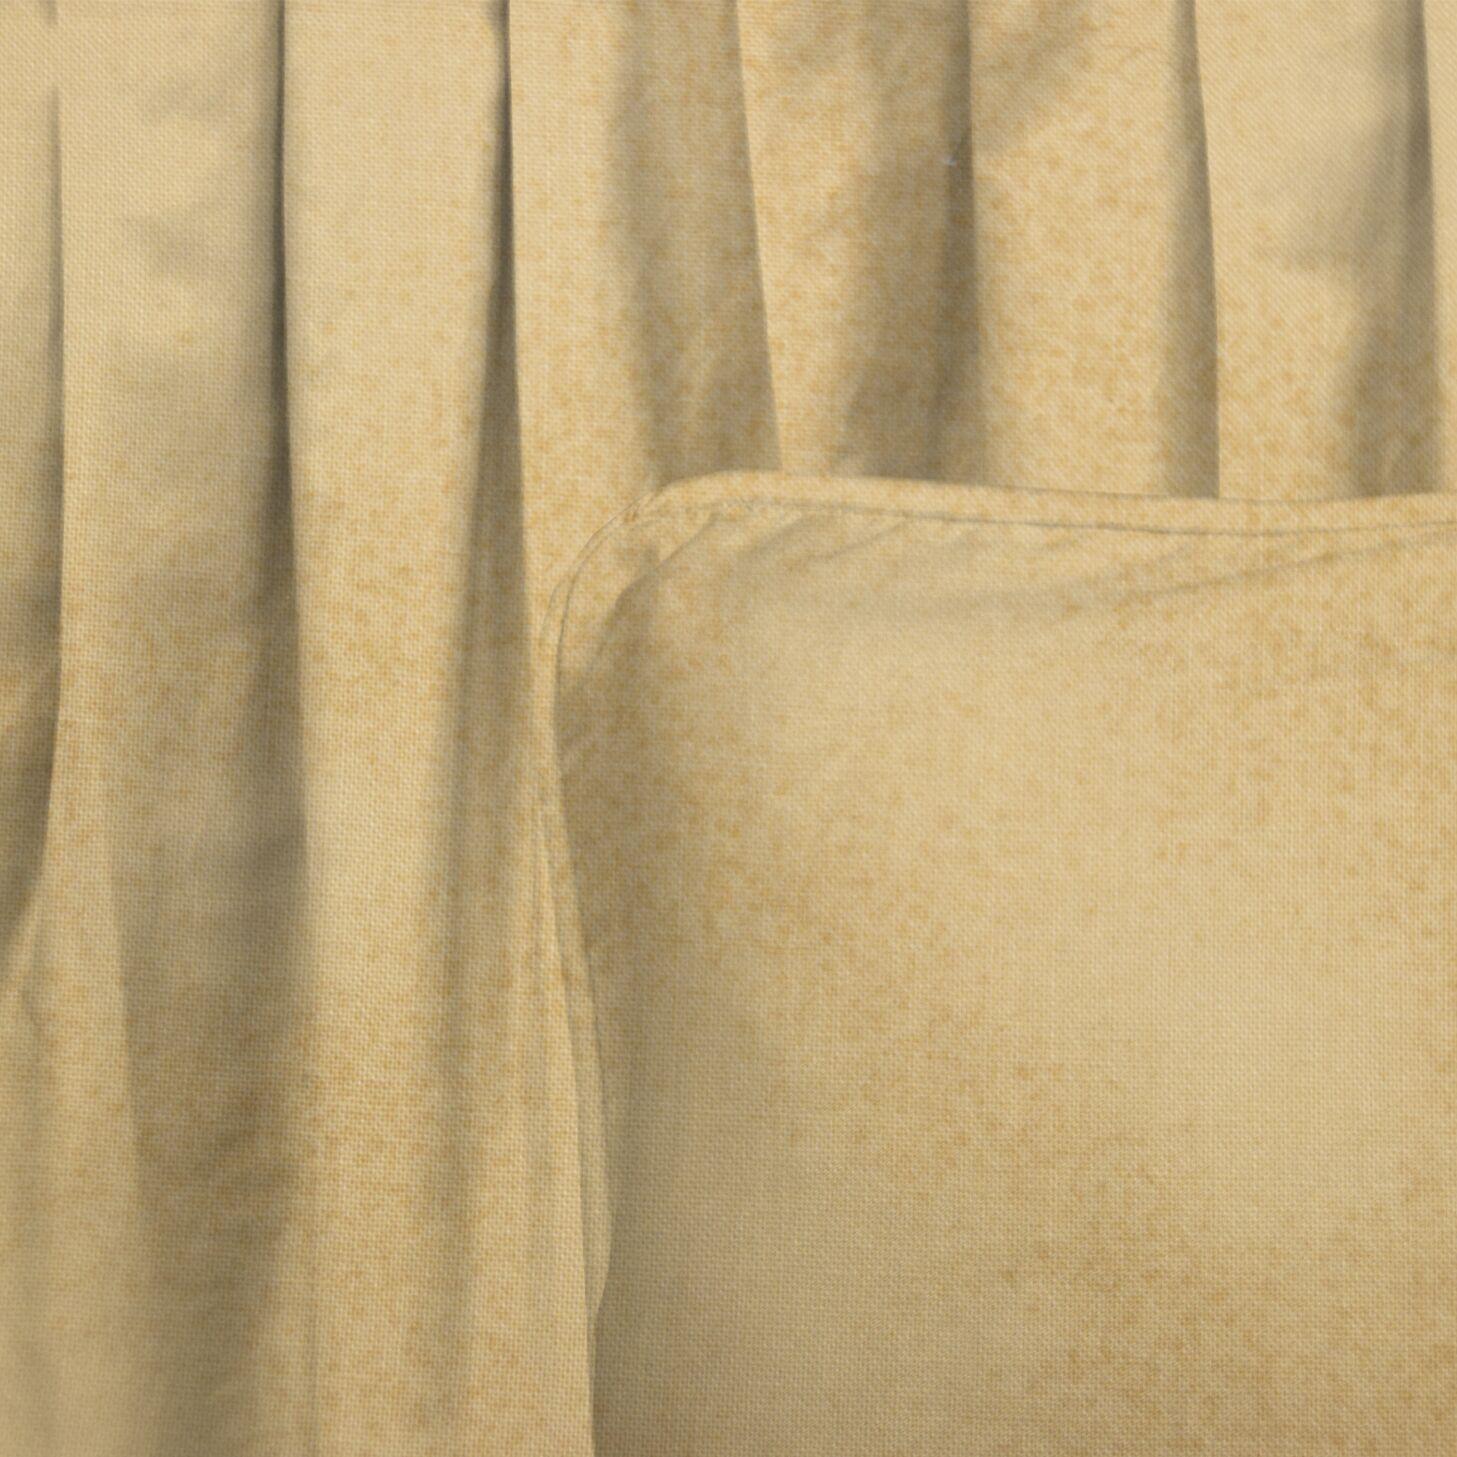 Schiller Peanut Bed Skirt Size: Queen